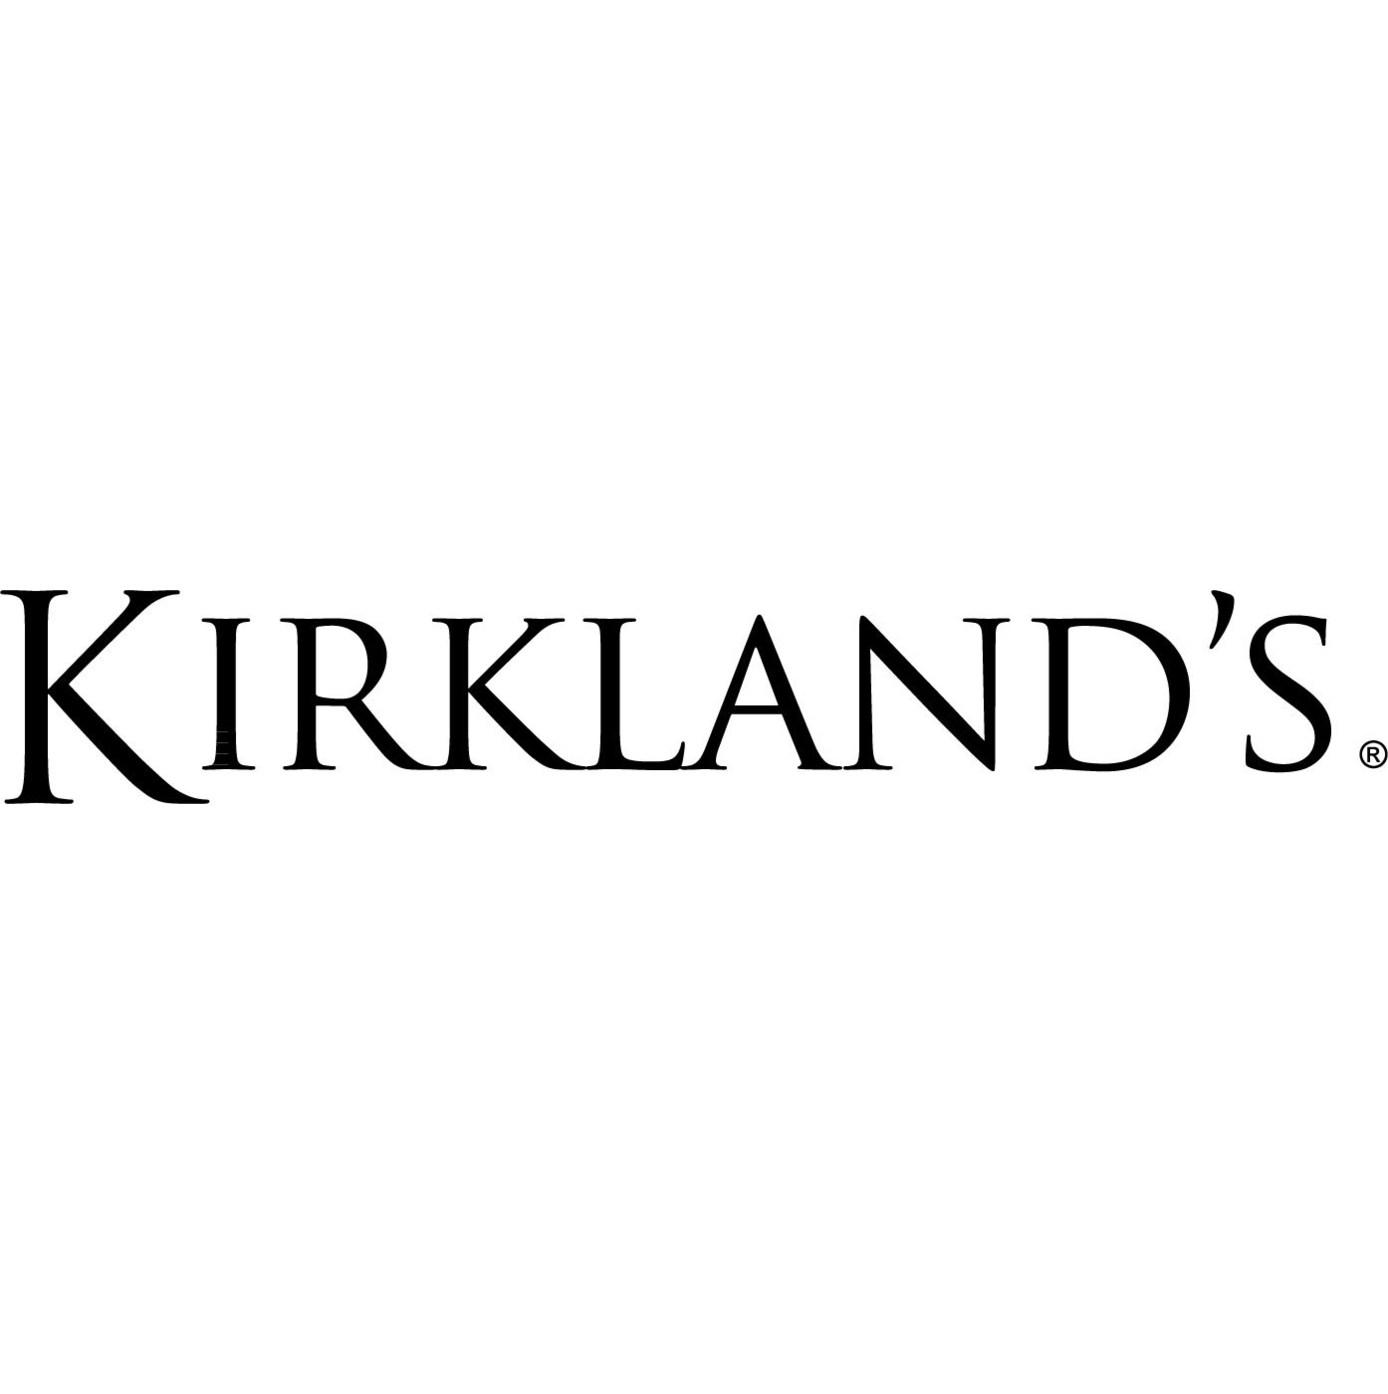 kirklands.jpg